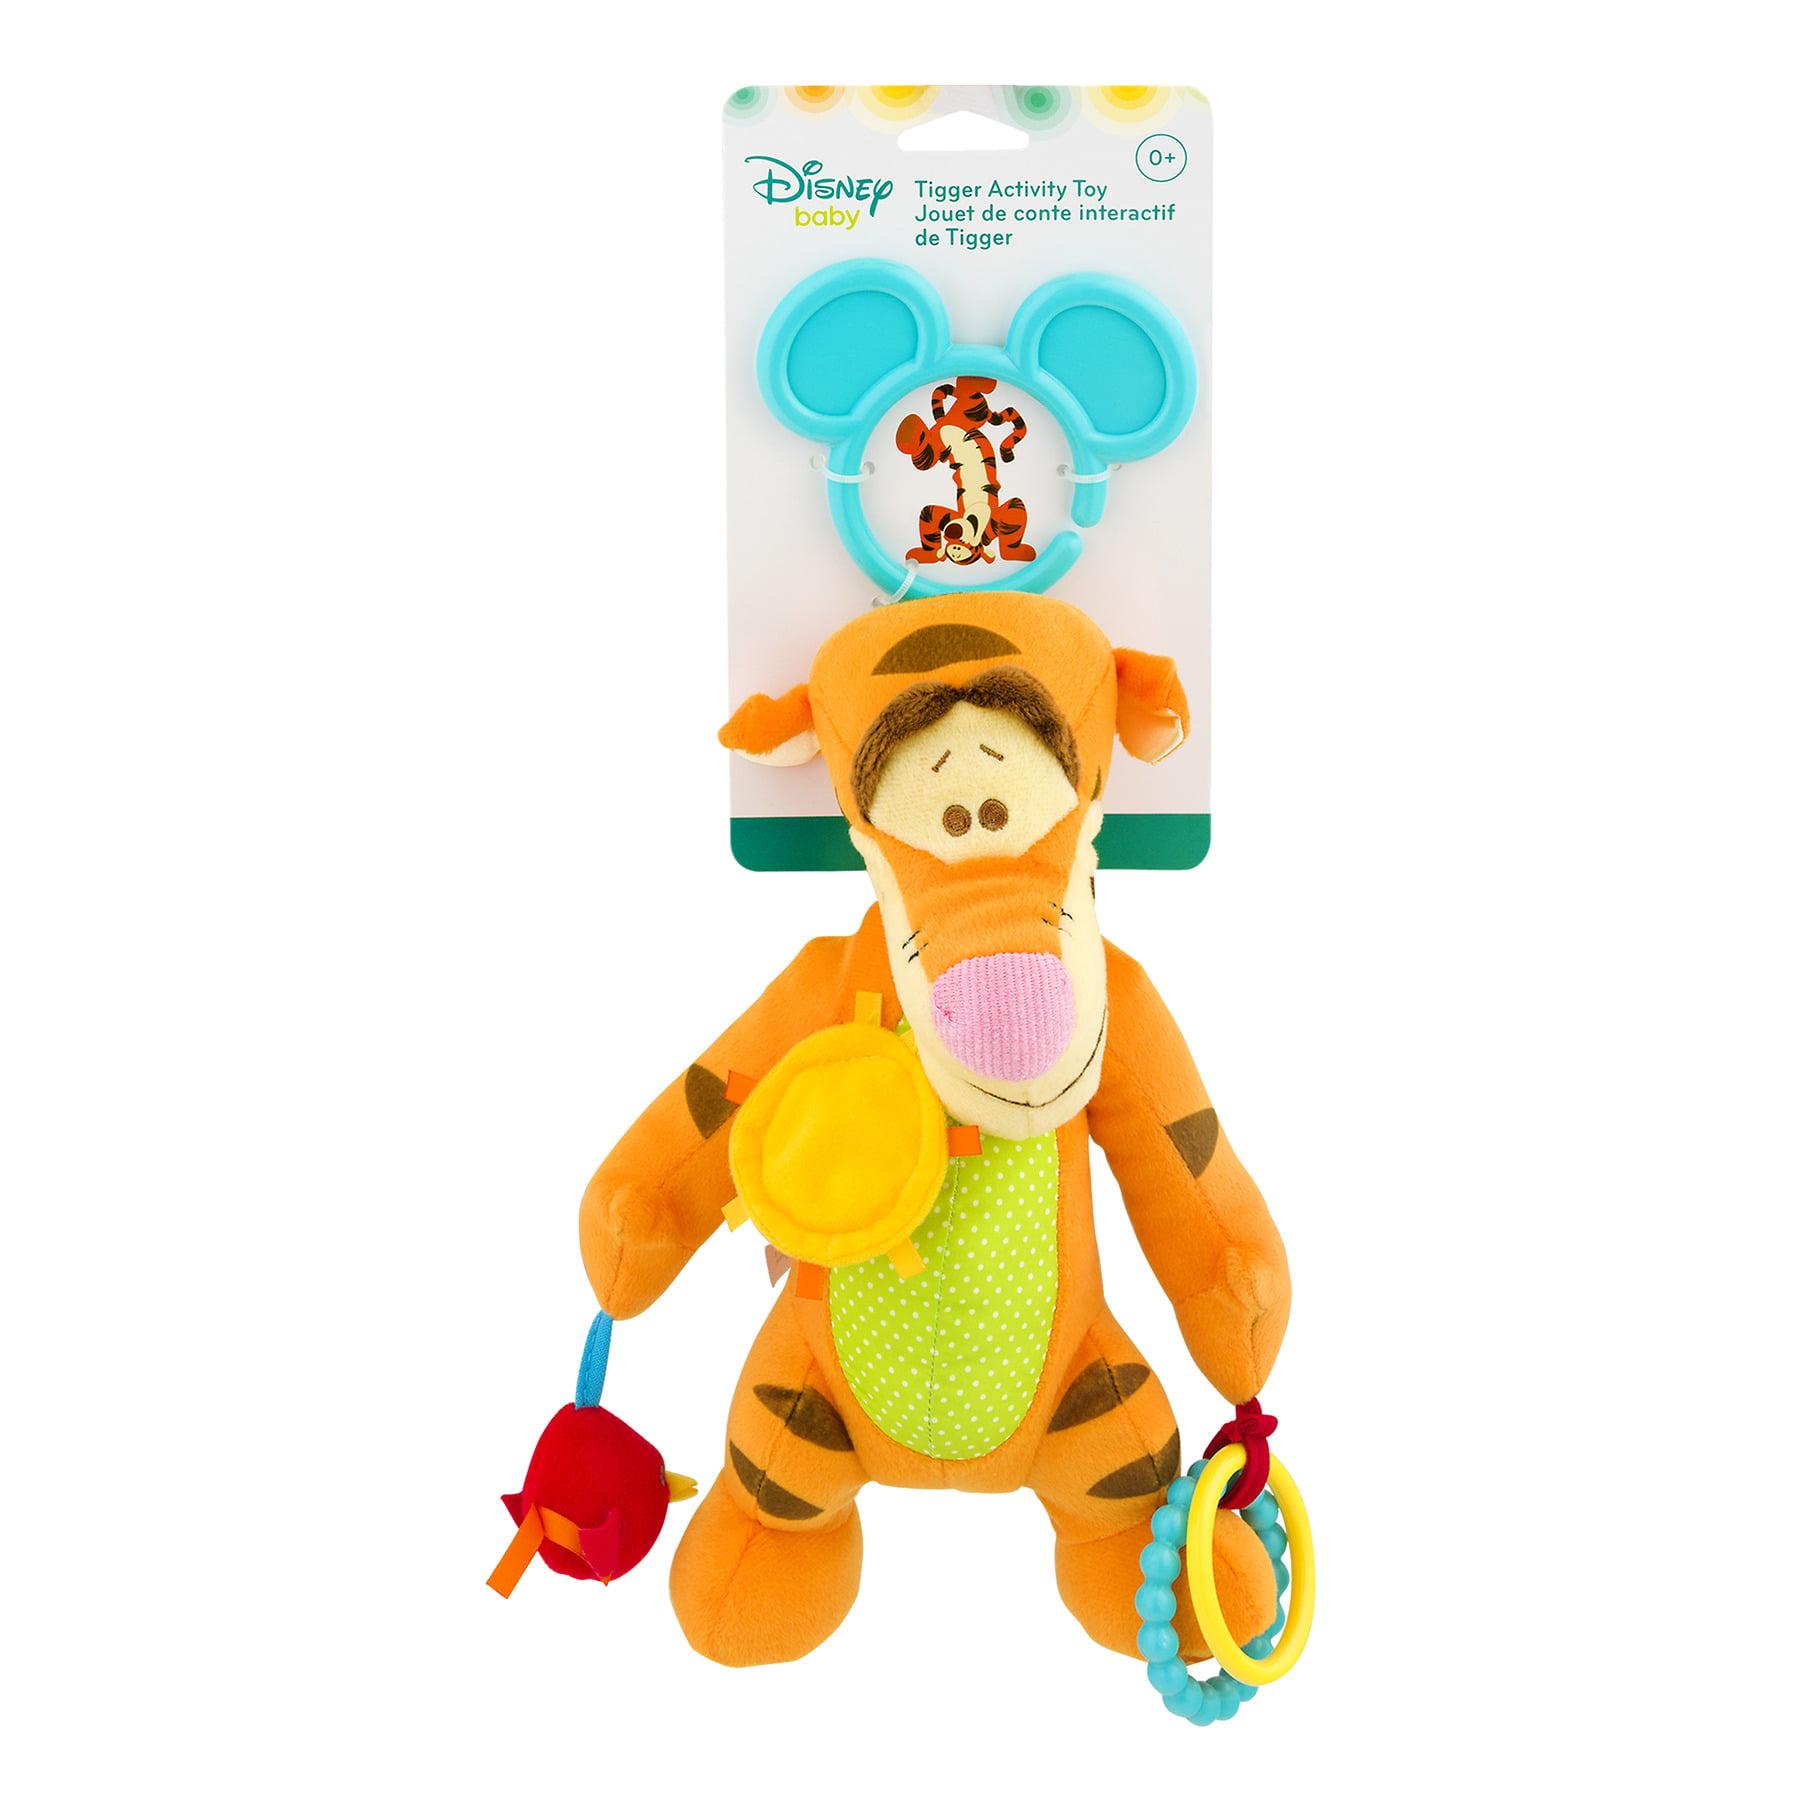 Disney Baby Tigger Activity Toy 0+, 1.0 CT by Disney